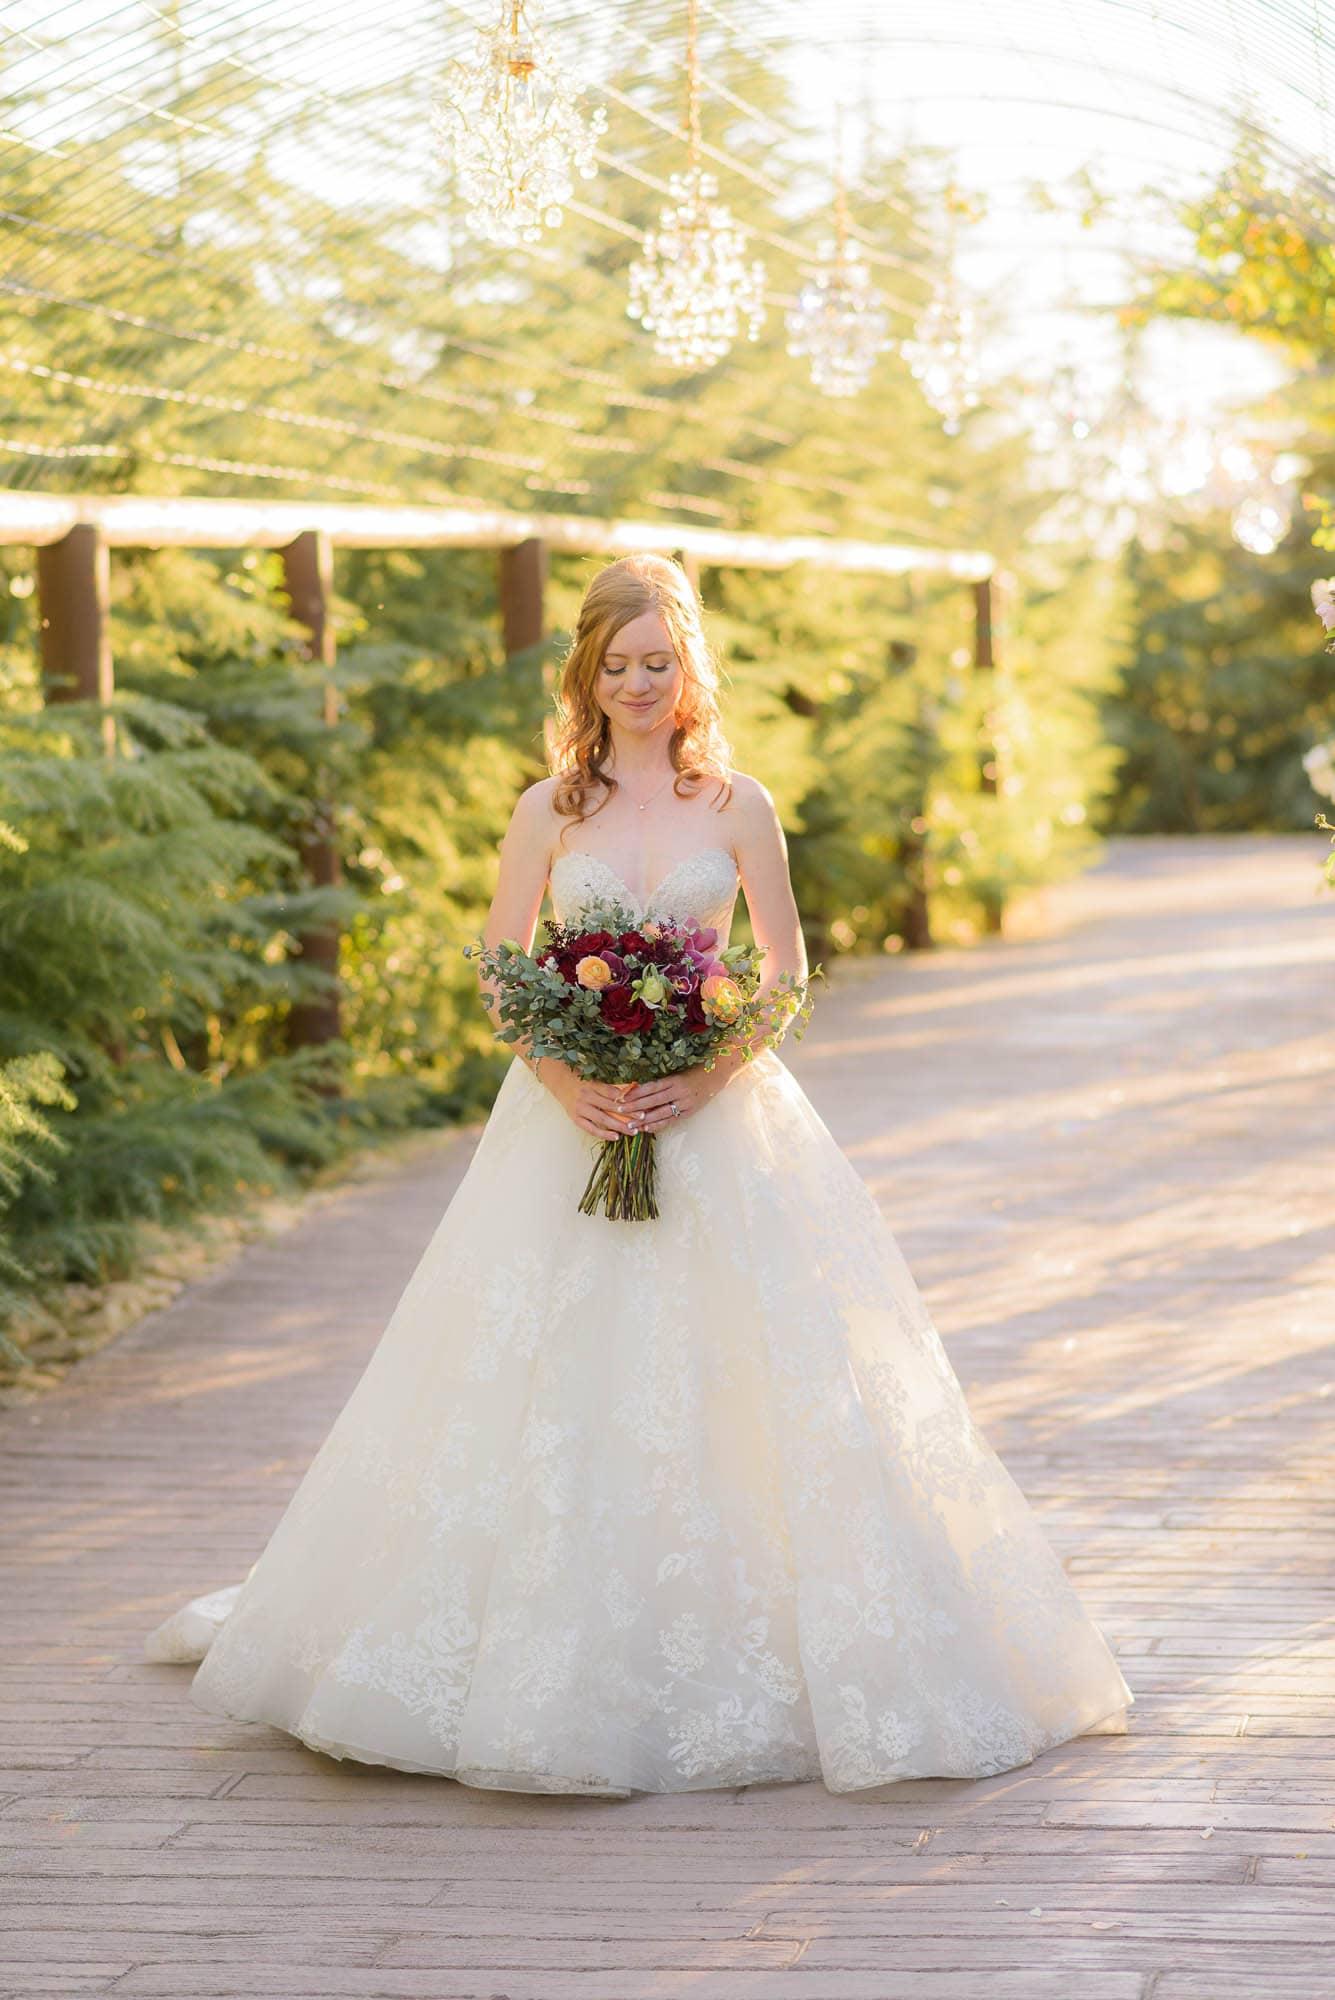 425_Alan_and_Heidi_Serendipity_Garden_Wedding_10-27-2018